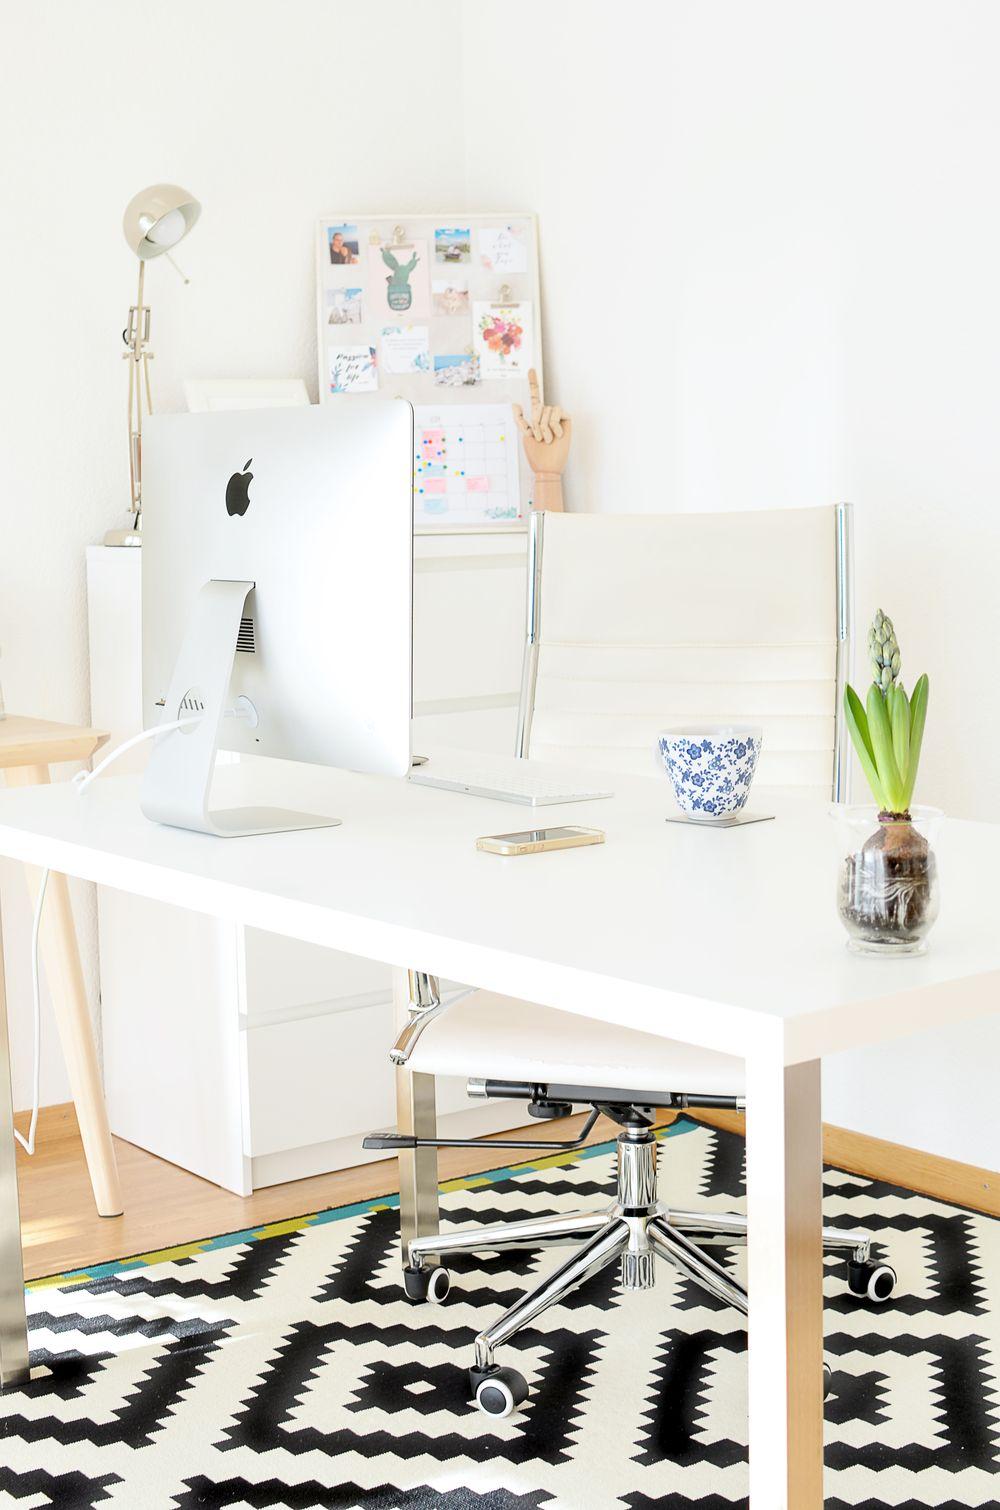 Duże biurko Ikea - biały blat, metalowe nogi